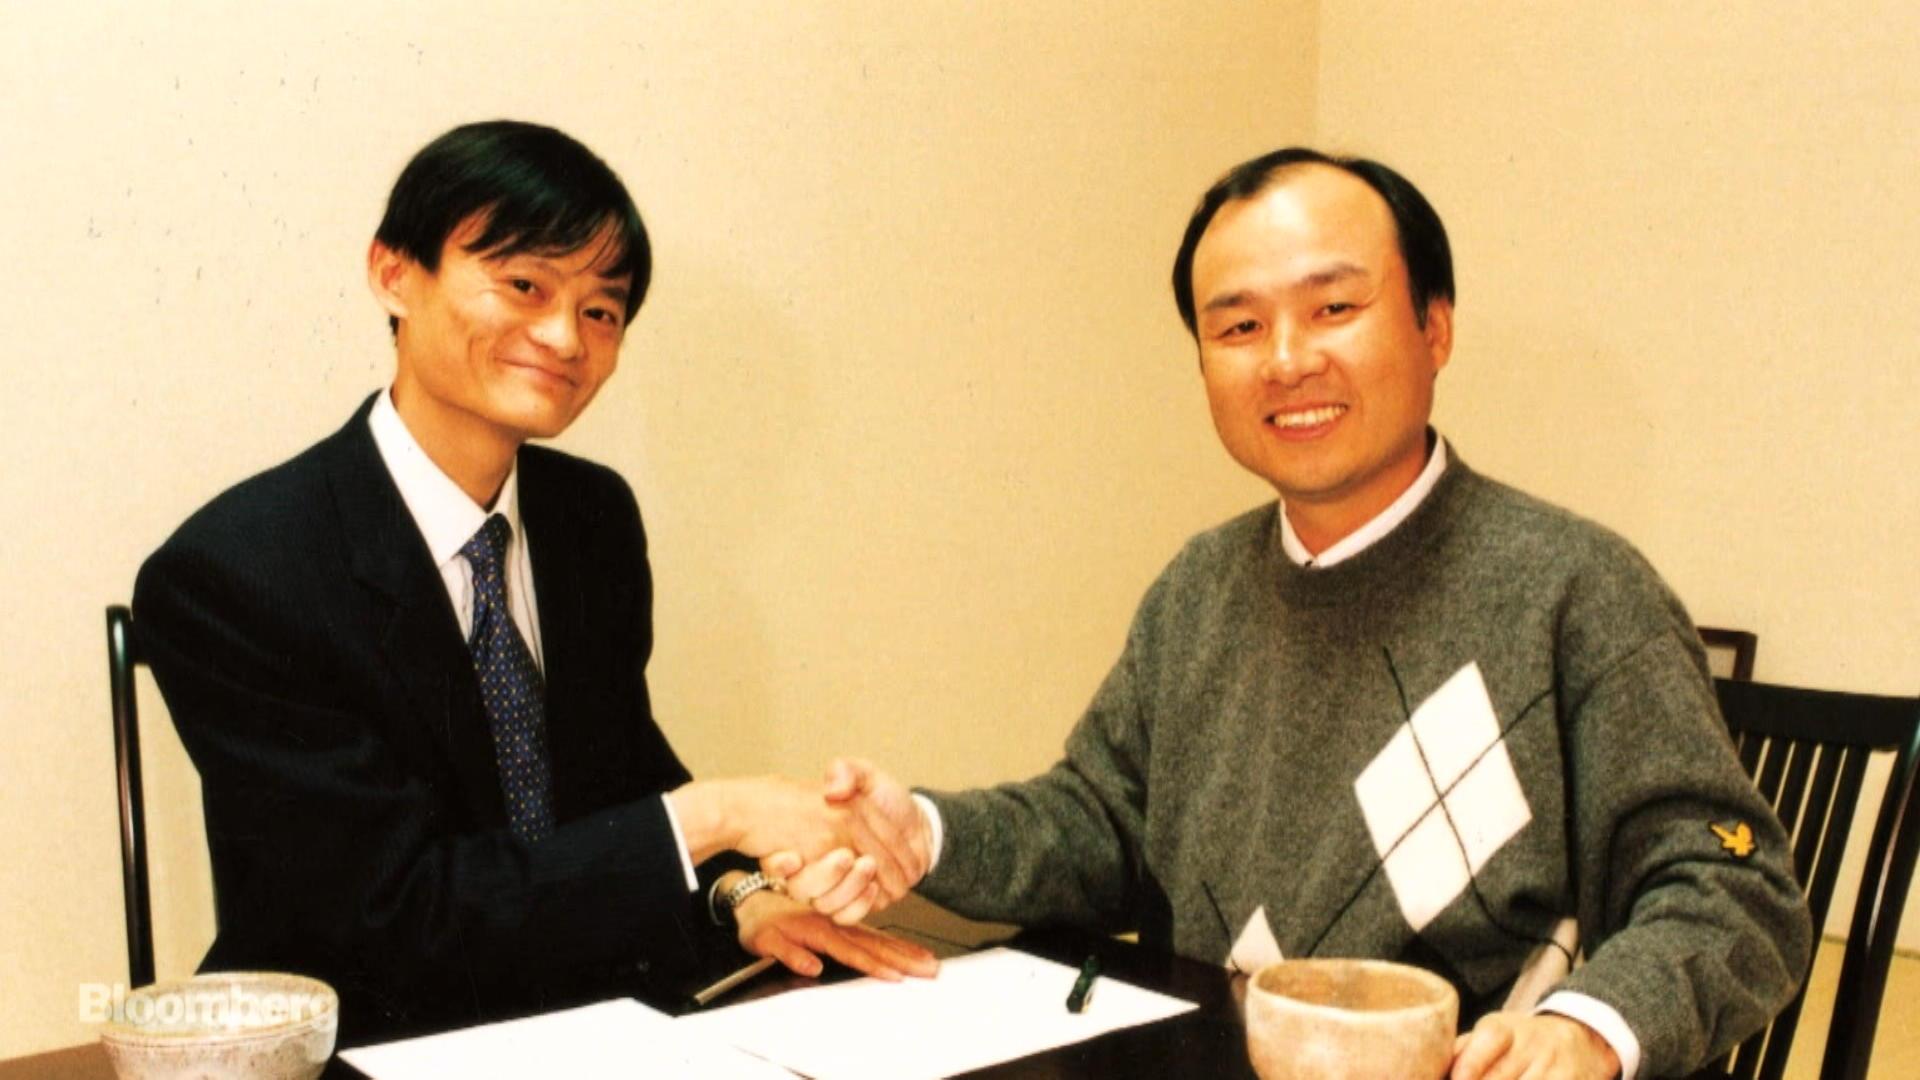 Flipboard Morgan Stanley When Masayoshi Son Met Jack Ma